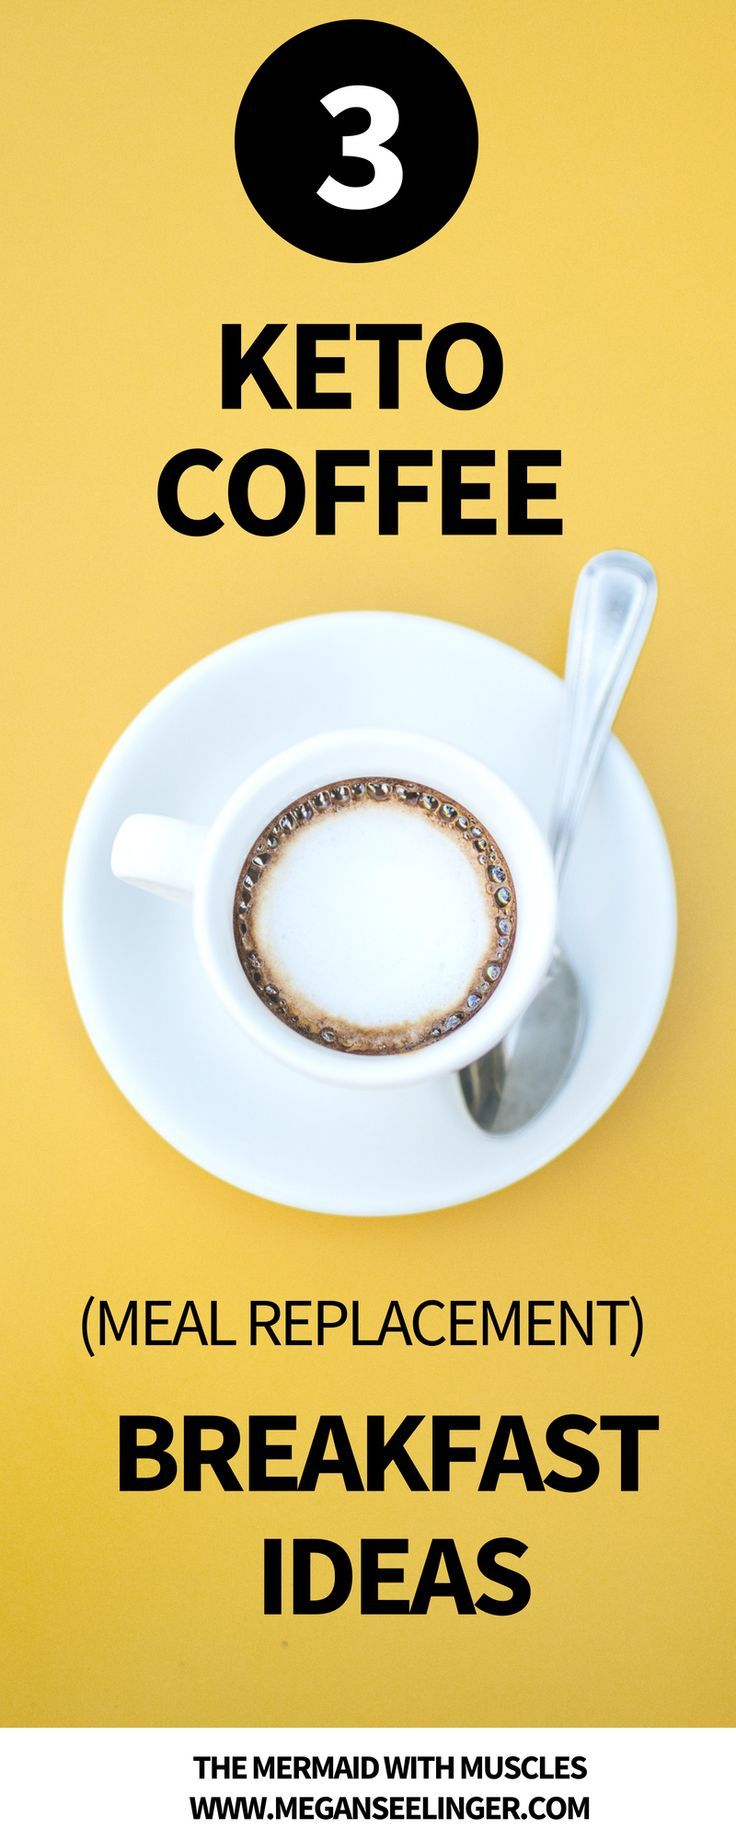 What is the Best Keto Coffee Creamer + 3 Keto Coffee